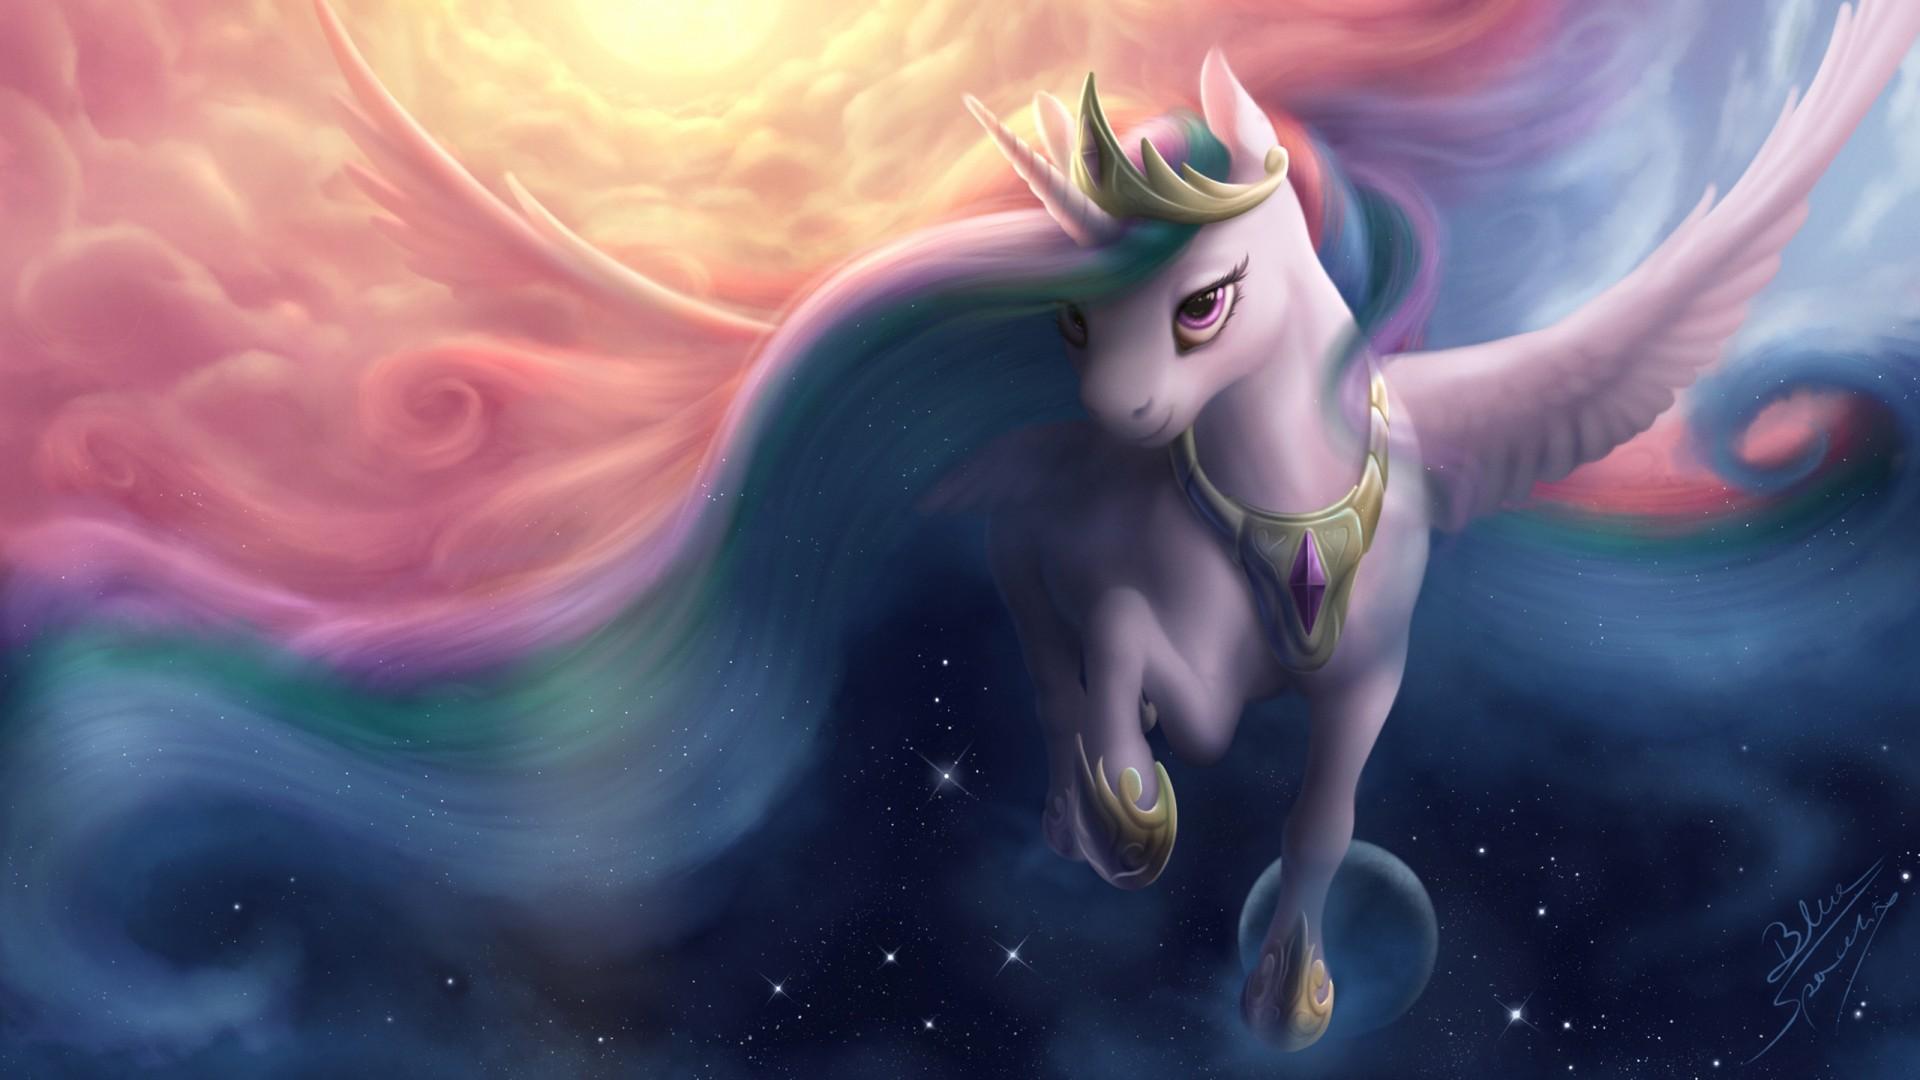 Fantasy Girl Hd Wallpaper Download Princess Luna Alicorn My Little Pony Friendship Is Magic